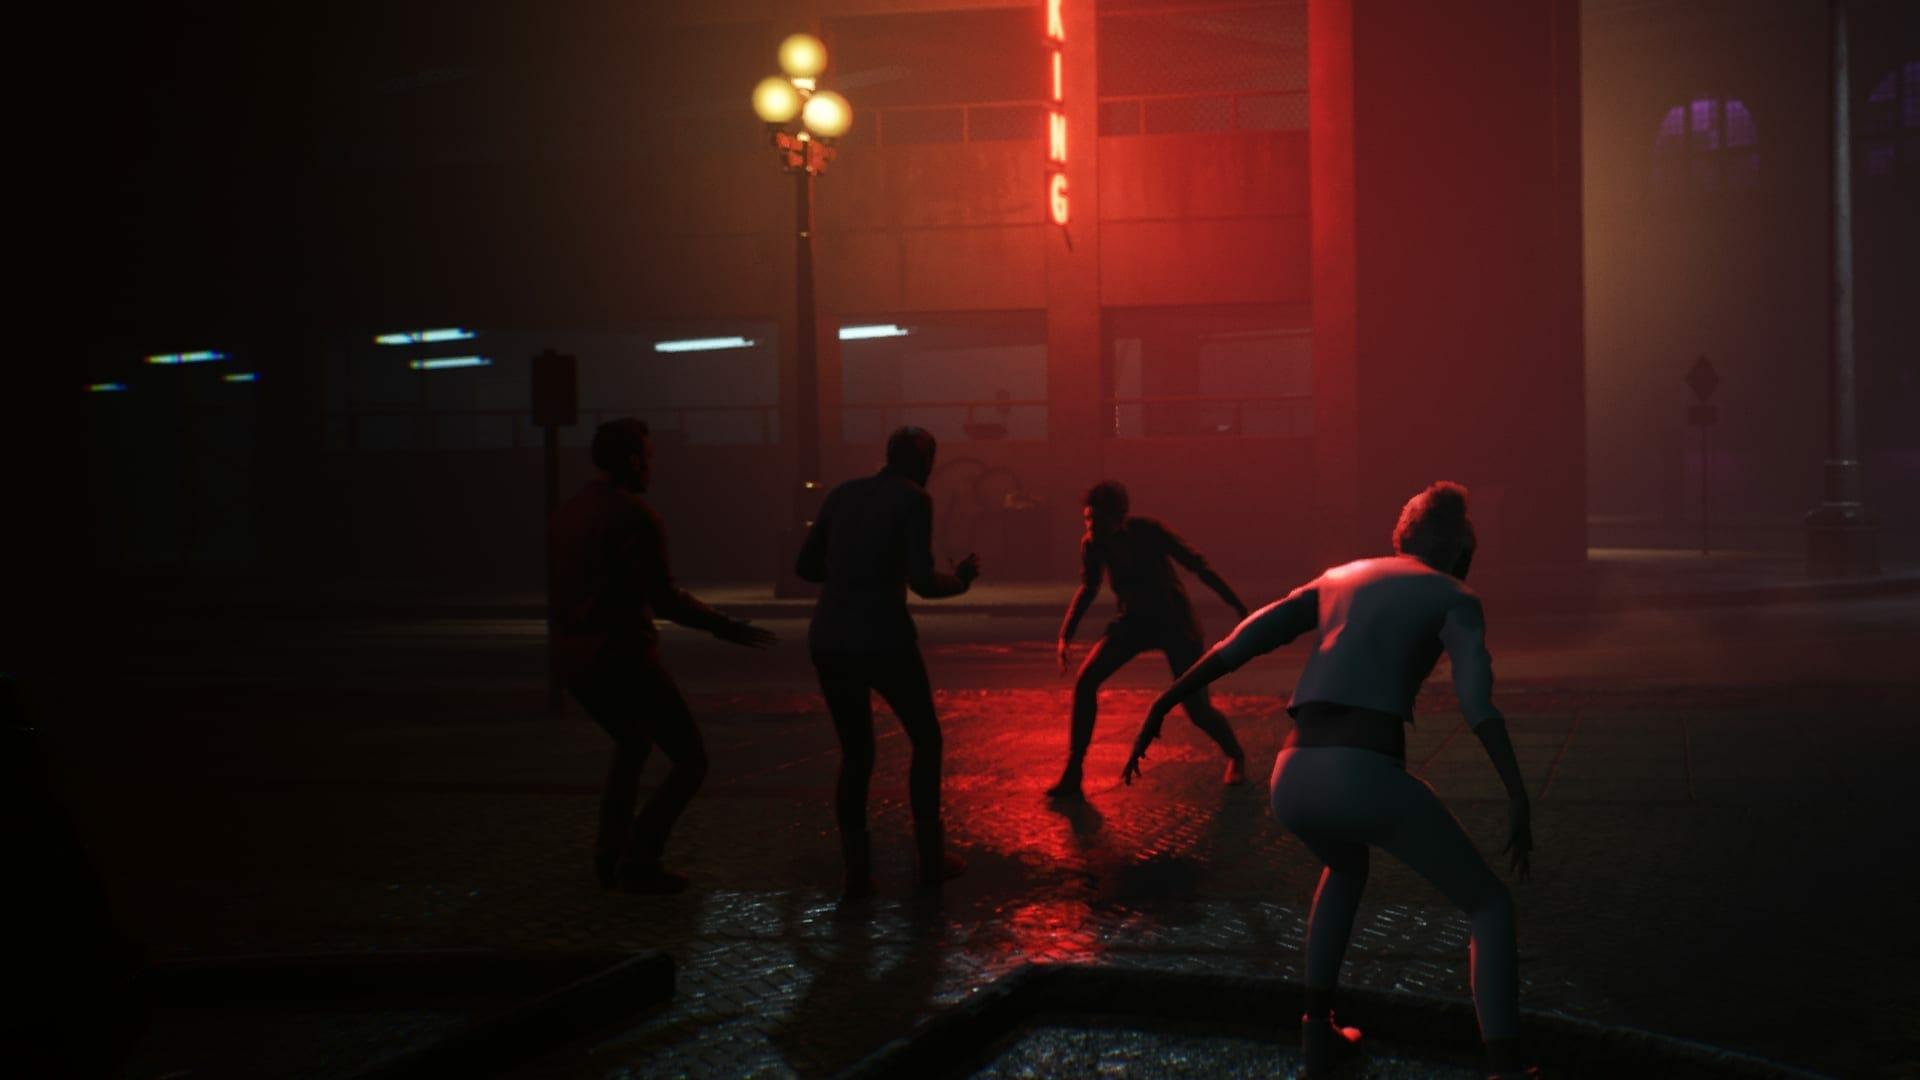 Vampire: The Masquerade - Bloodlines 2 announced